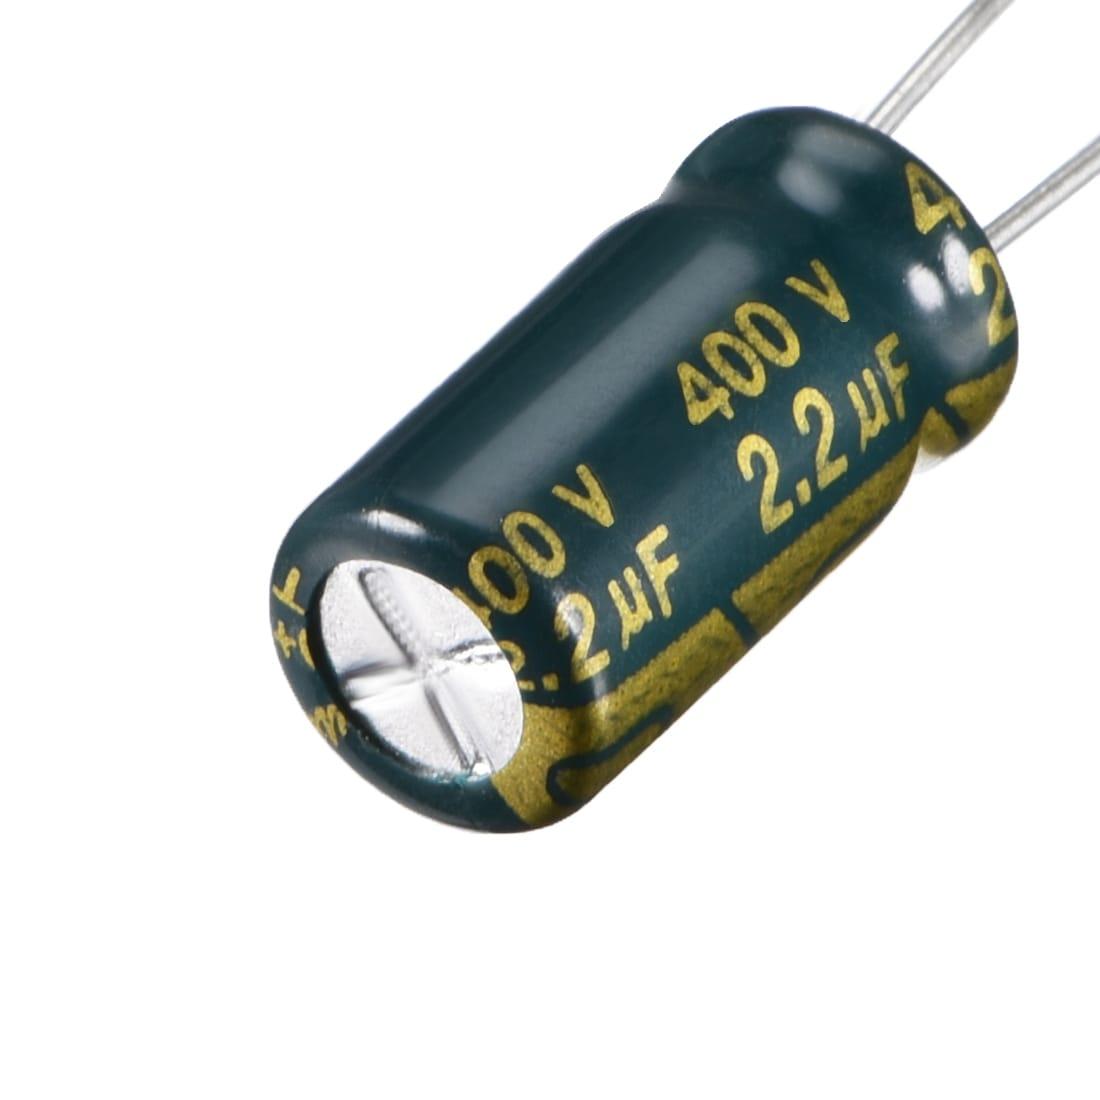 50 PCS 2.2UF//400V 8x12mm 105°C Radial Electrolytic Capacitors 400V 2.2UF